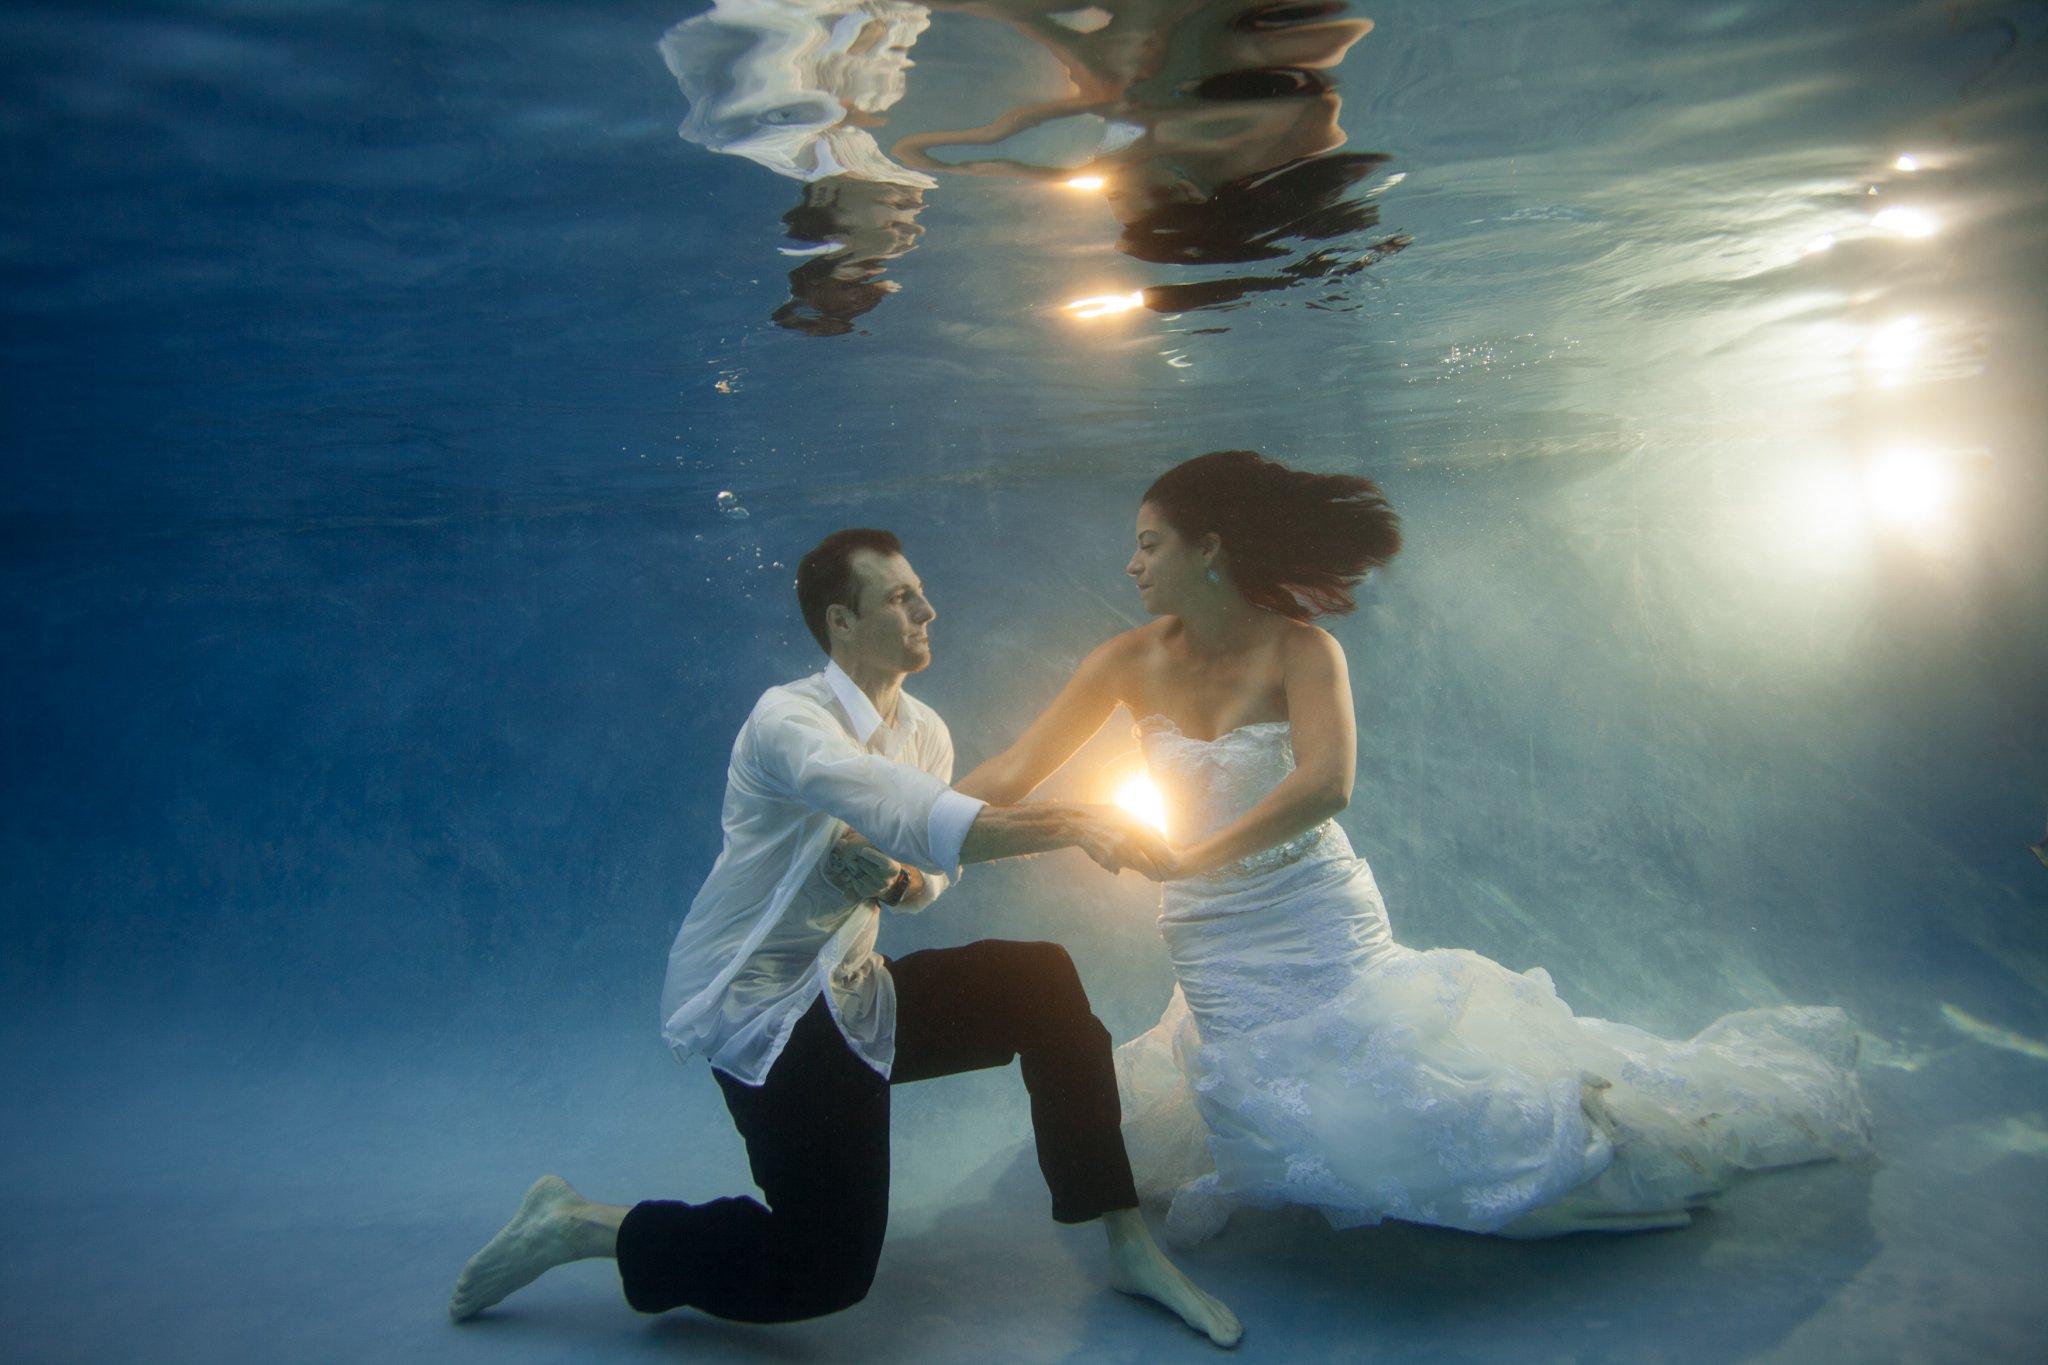 Arizona underwater trash the dress photos in a pool